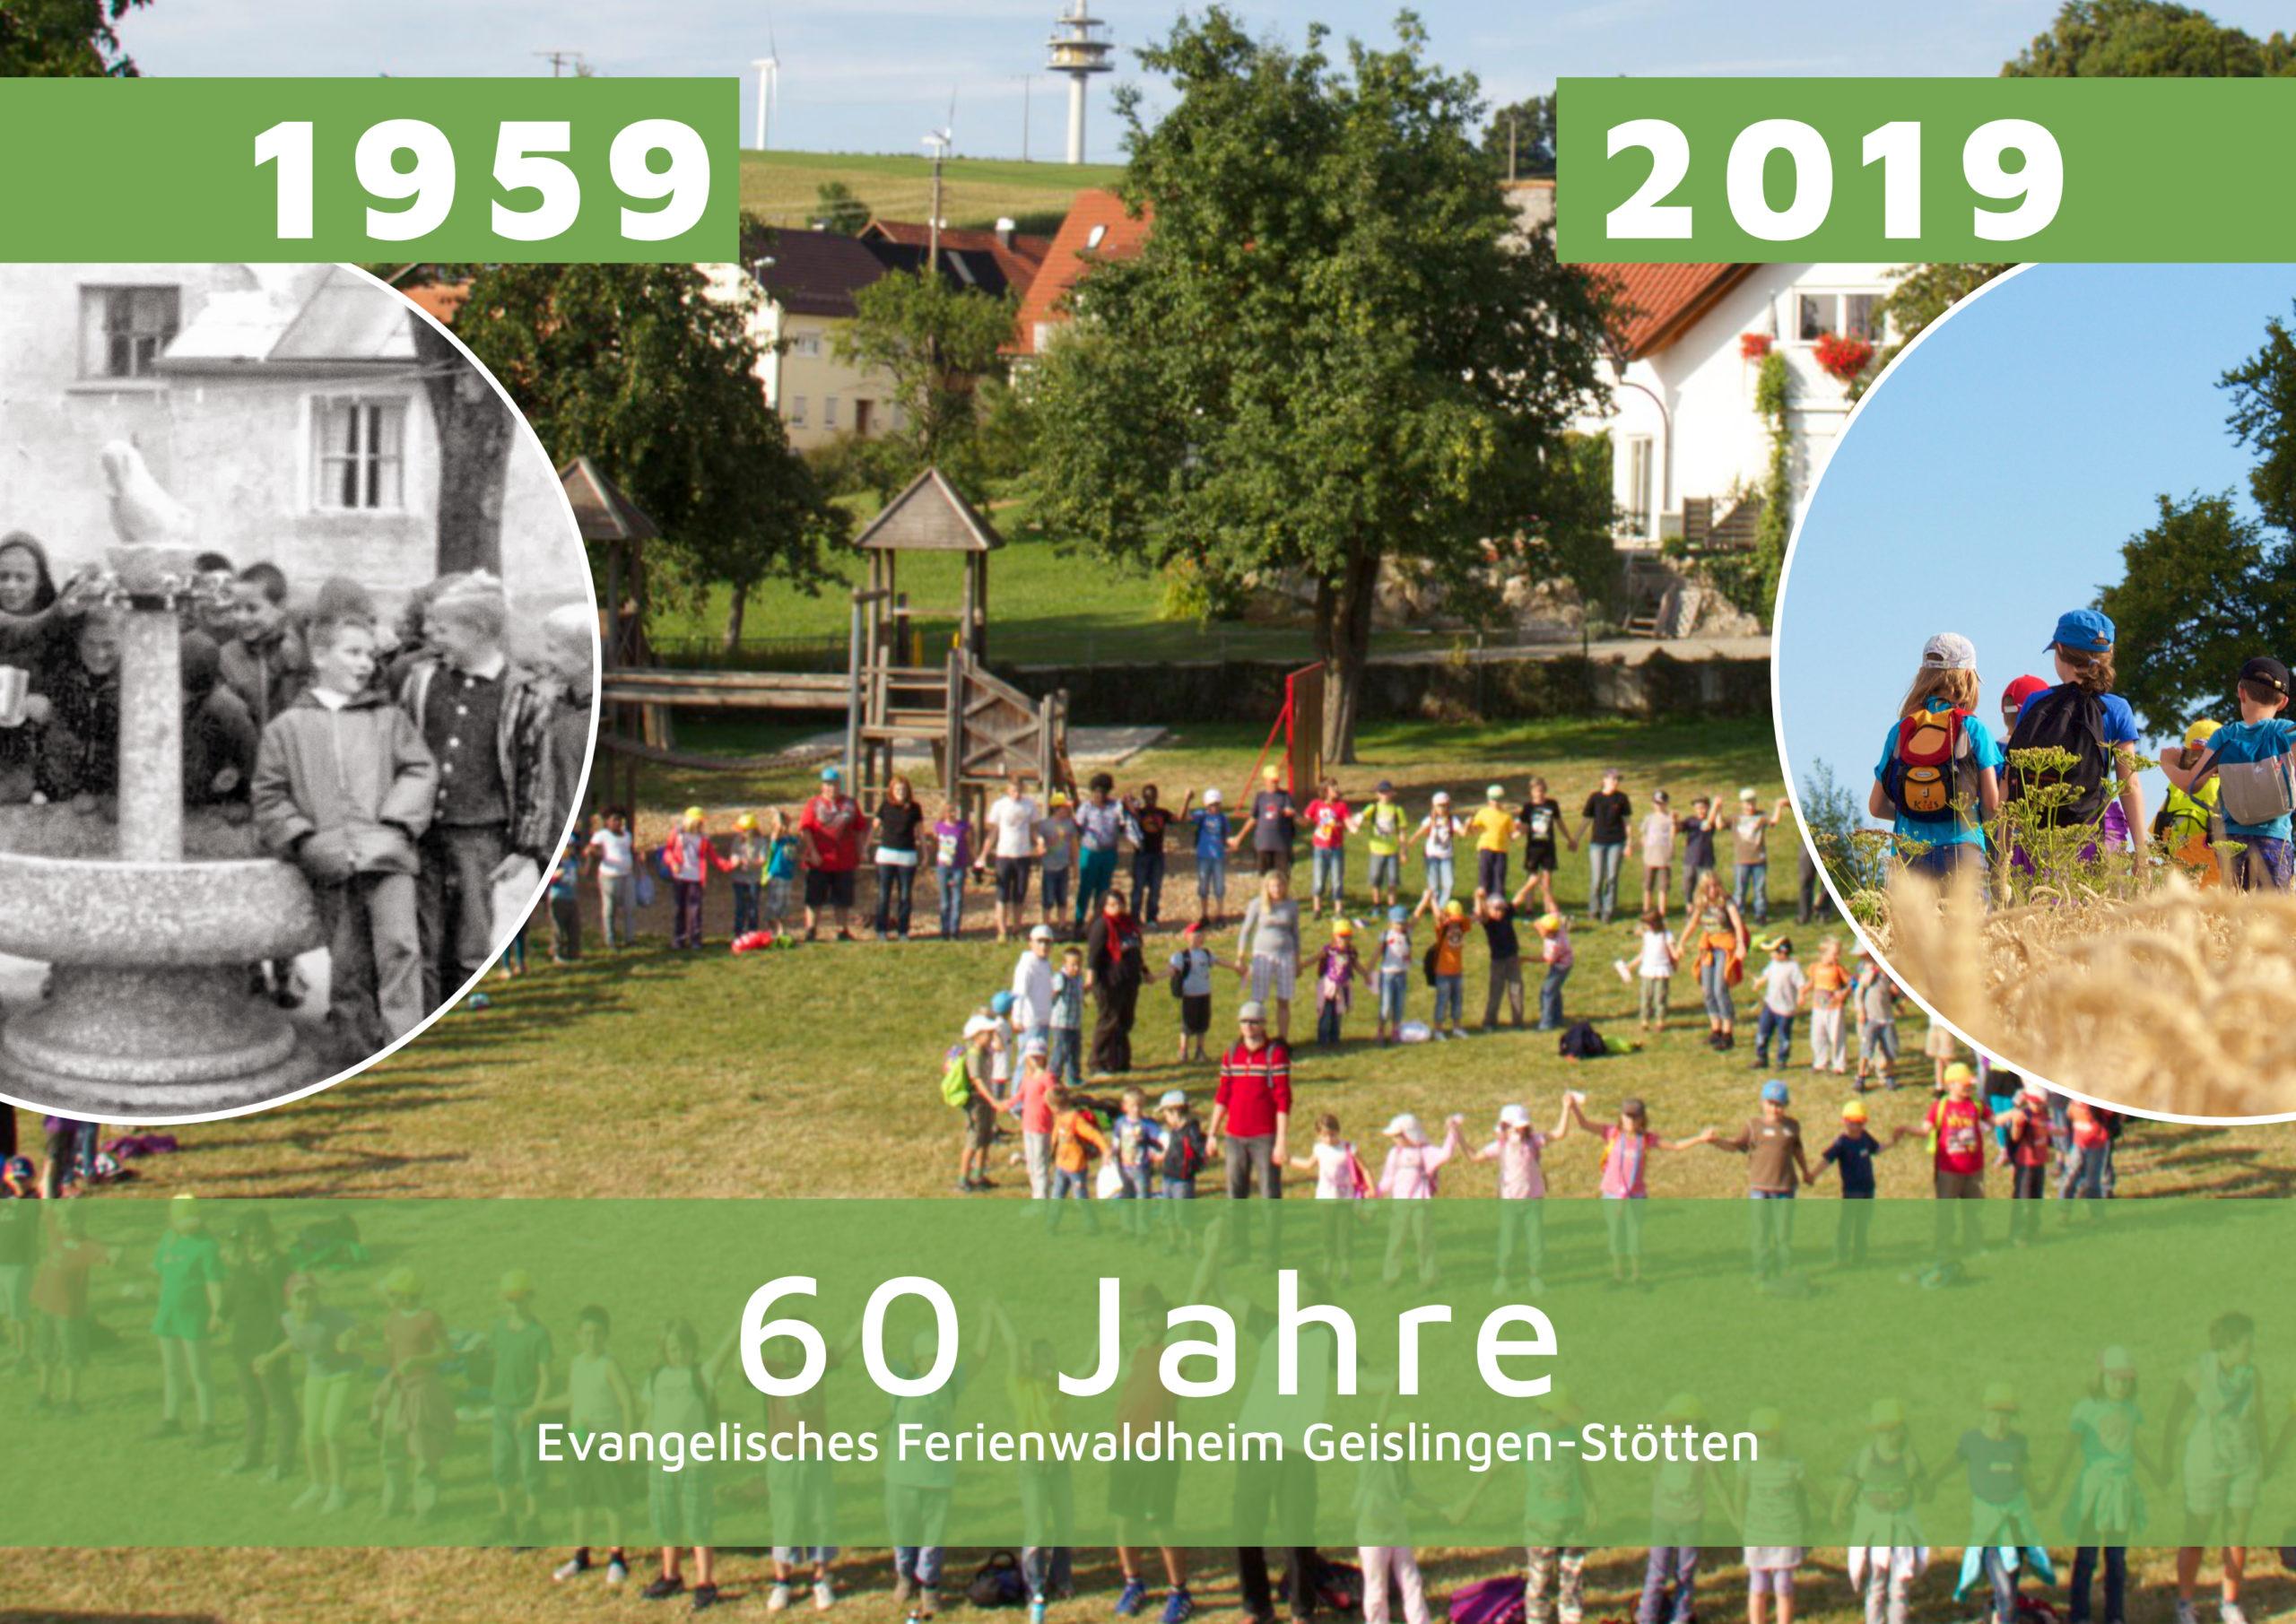 2019 Jubiläum Vergleichsfotos_1